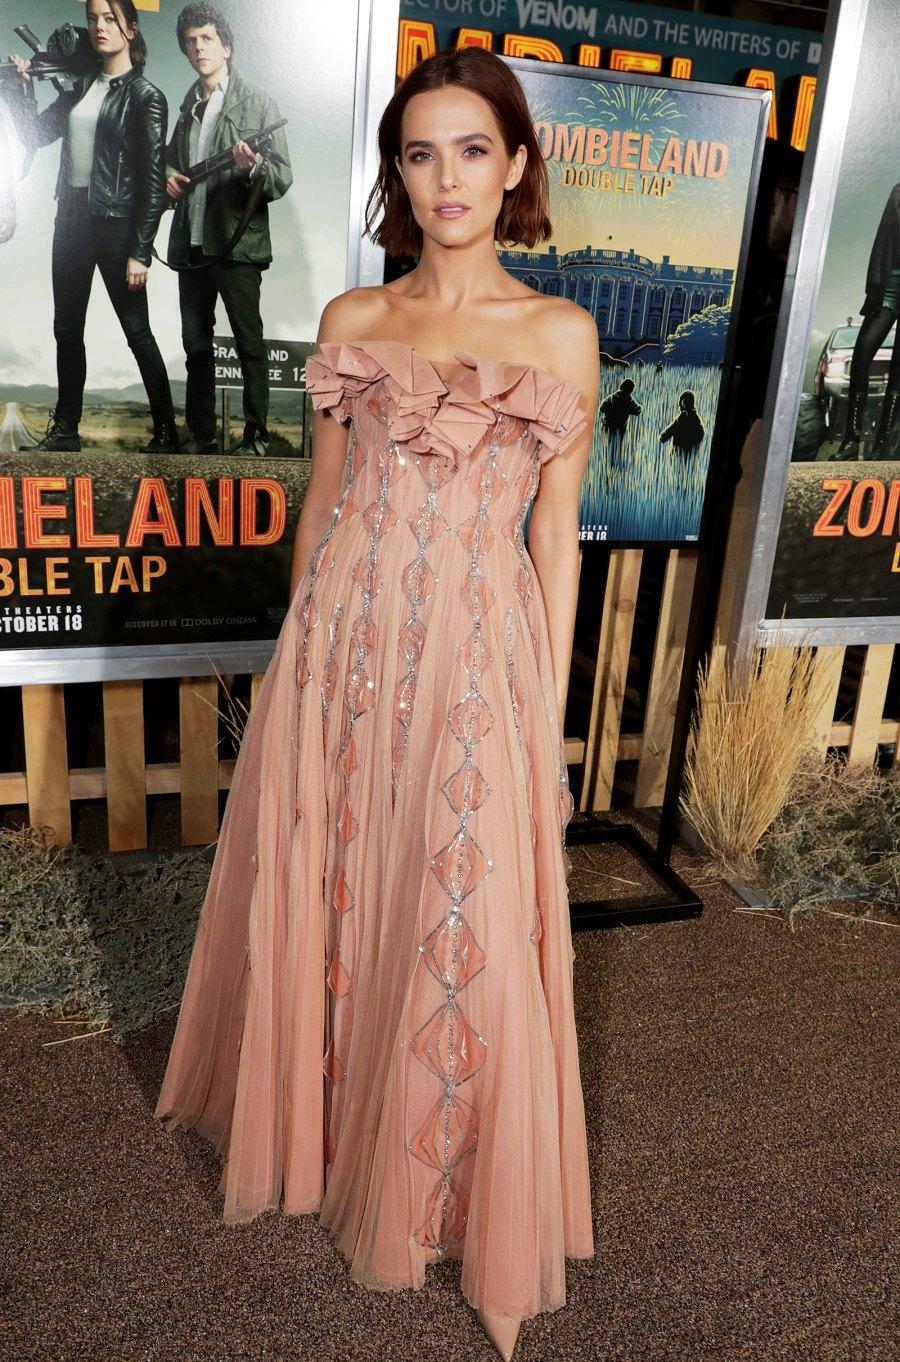 Zoey Deutch Dusty Rose Gown October 10, 2019